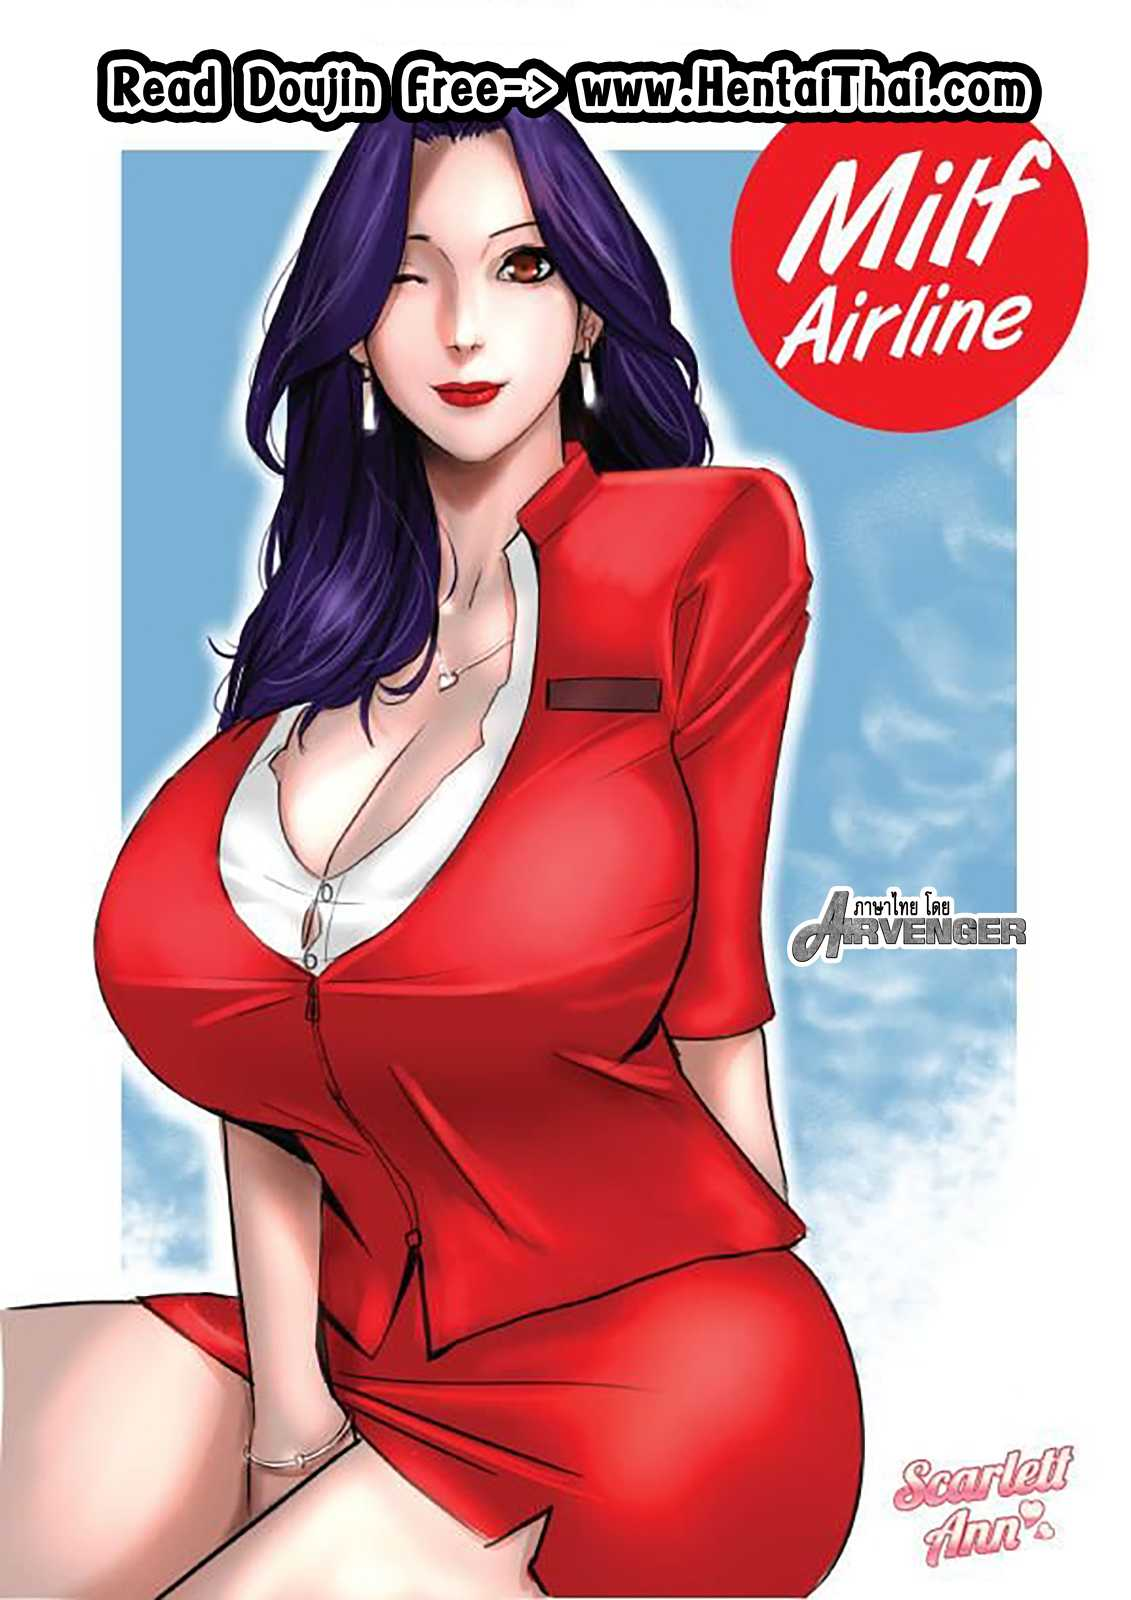 scarlet-ann-milf-airline